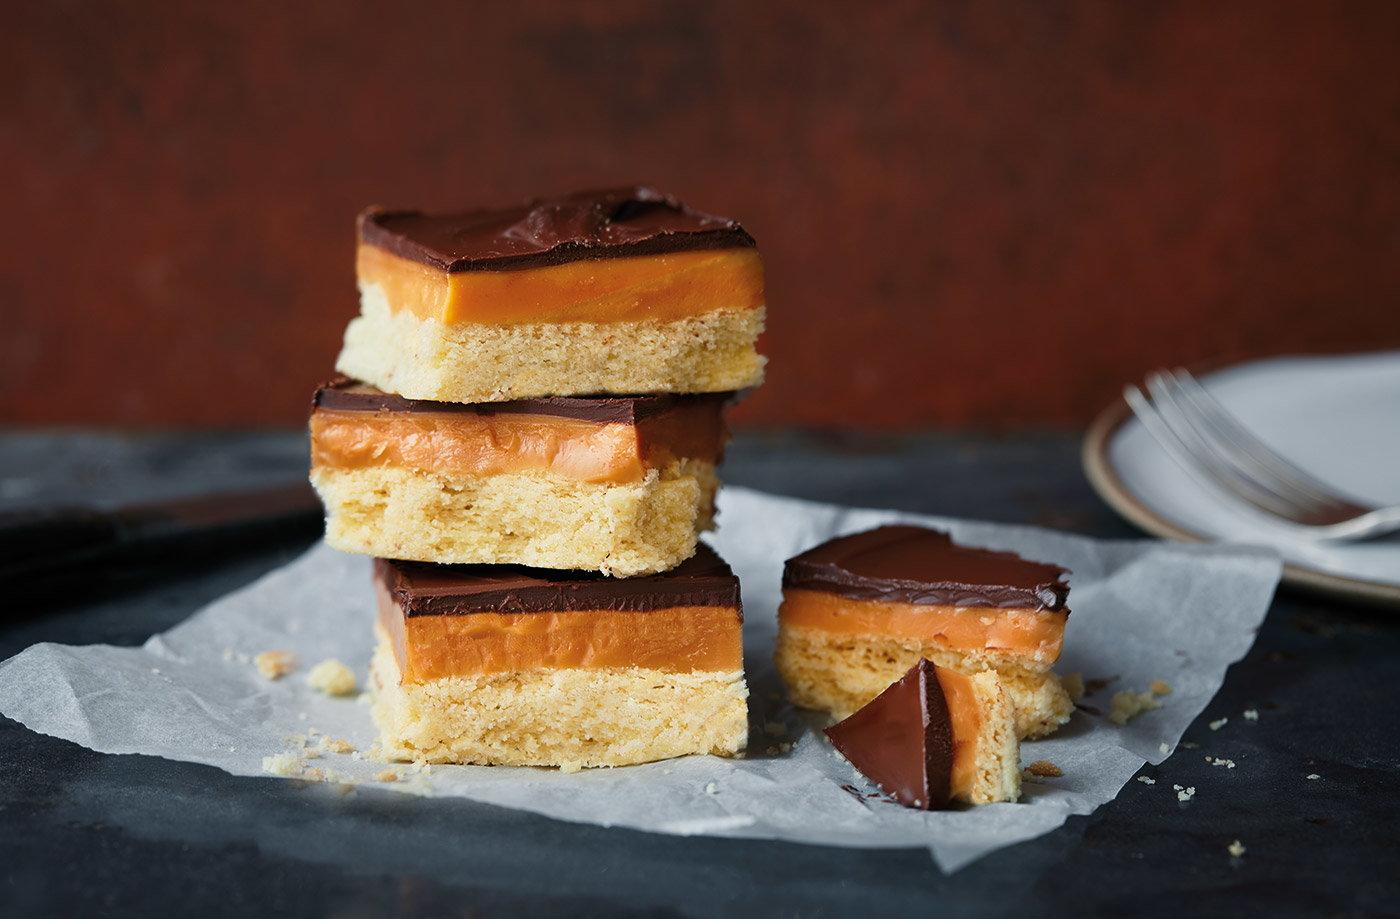 Salted Caramel Millionaires Shortbread